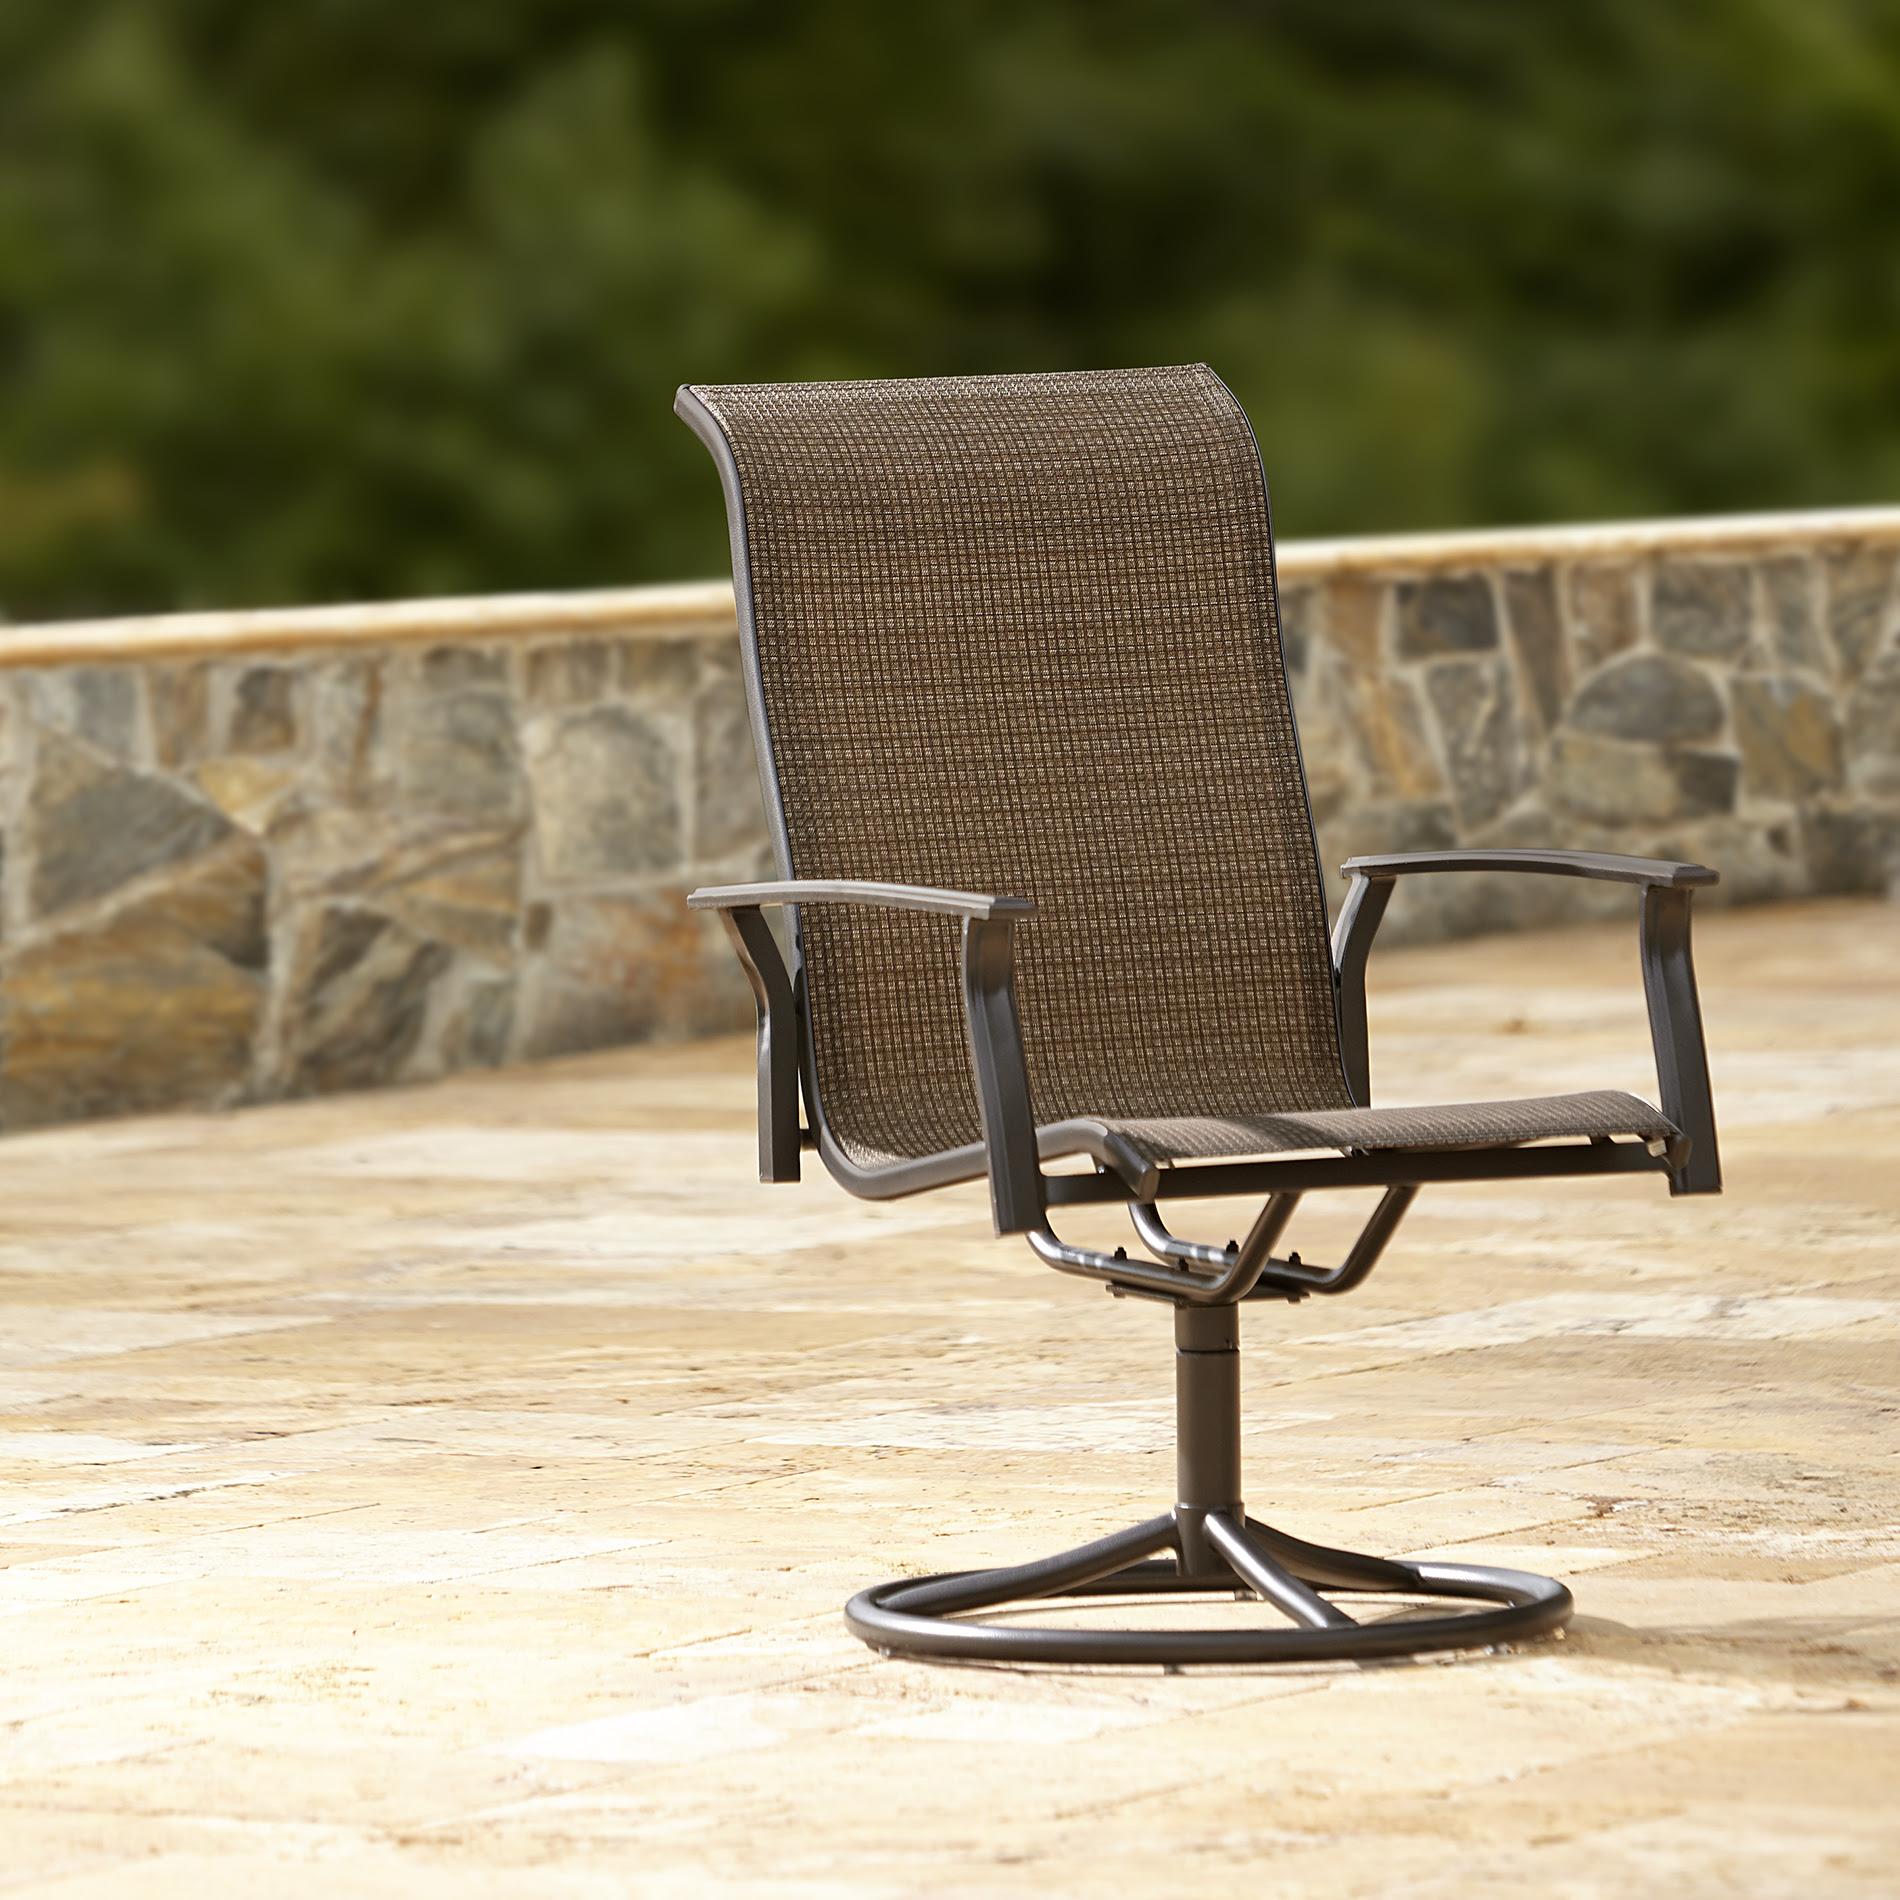 Garden Oasis Harrison 1pk Swivel Patio Dining Chair ...